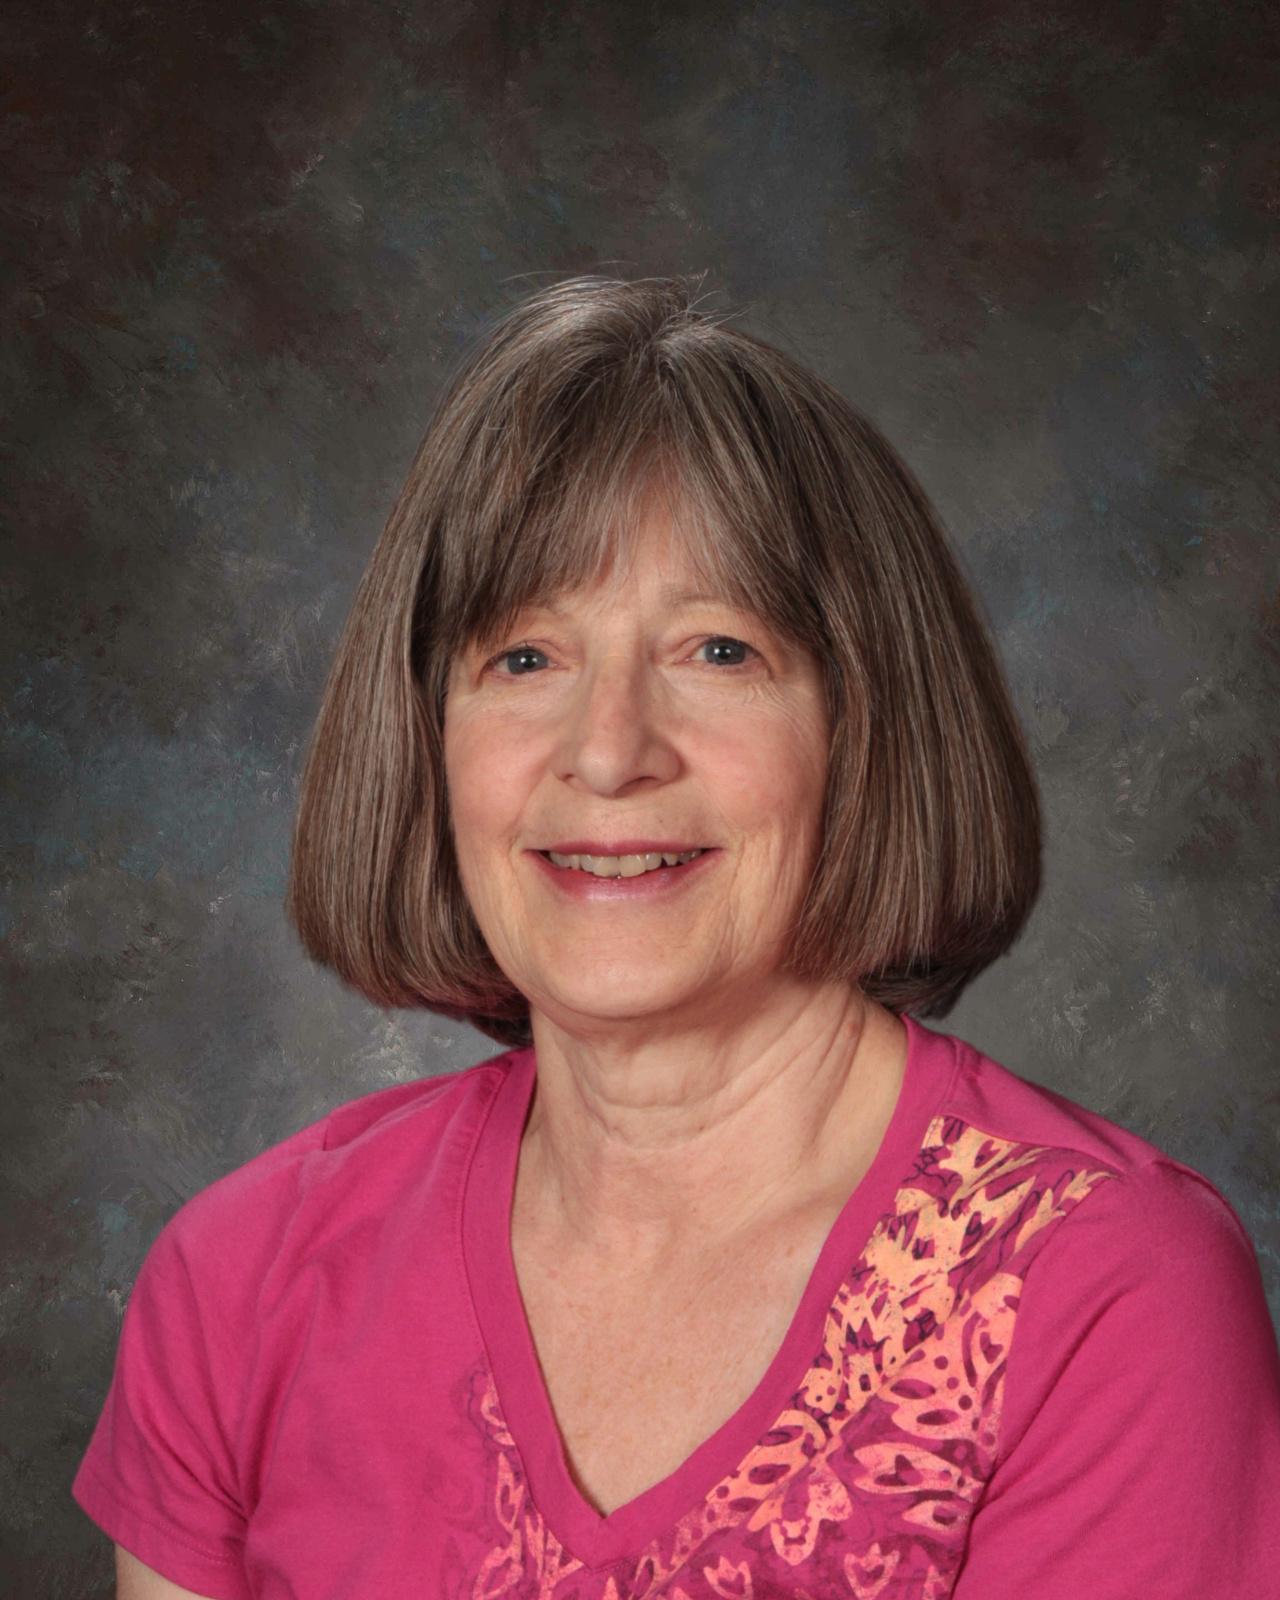 Denise Waskosky